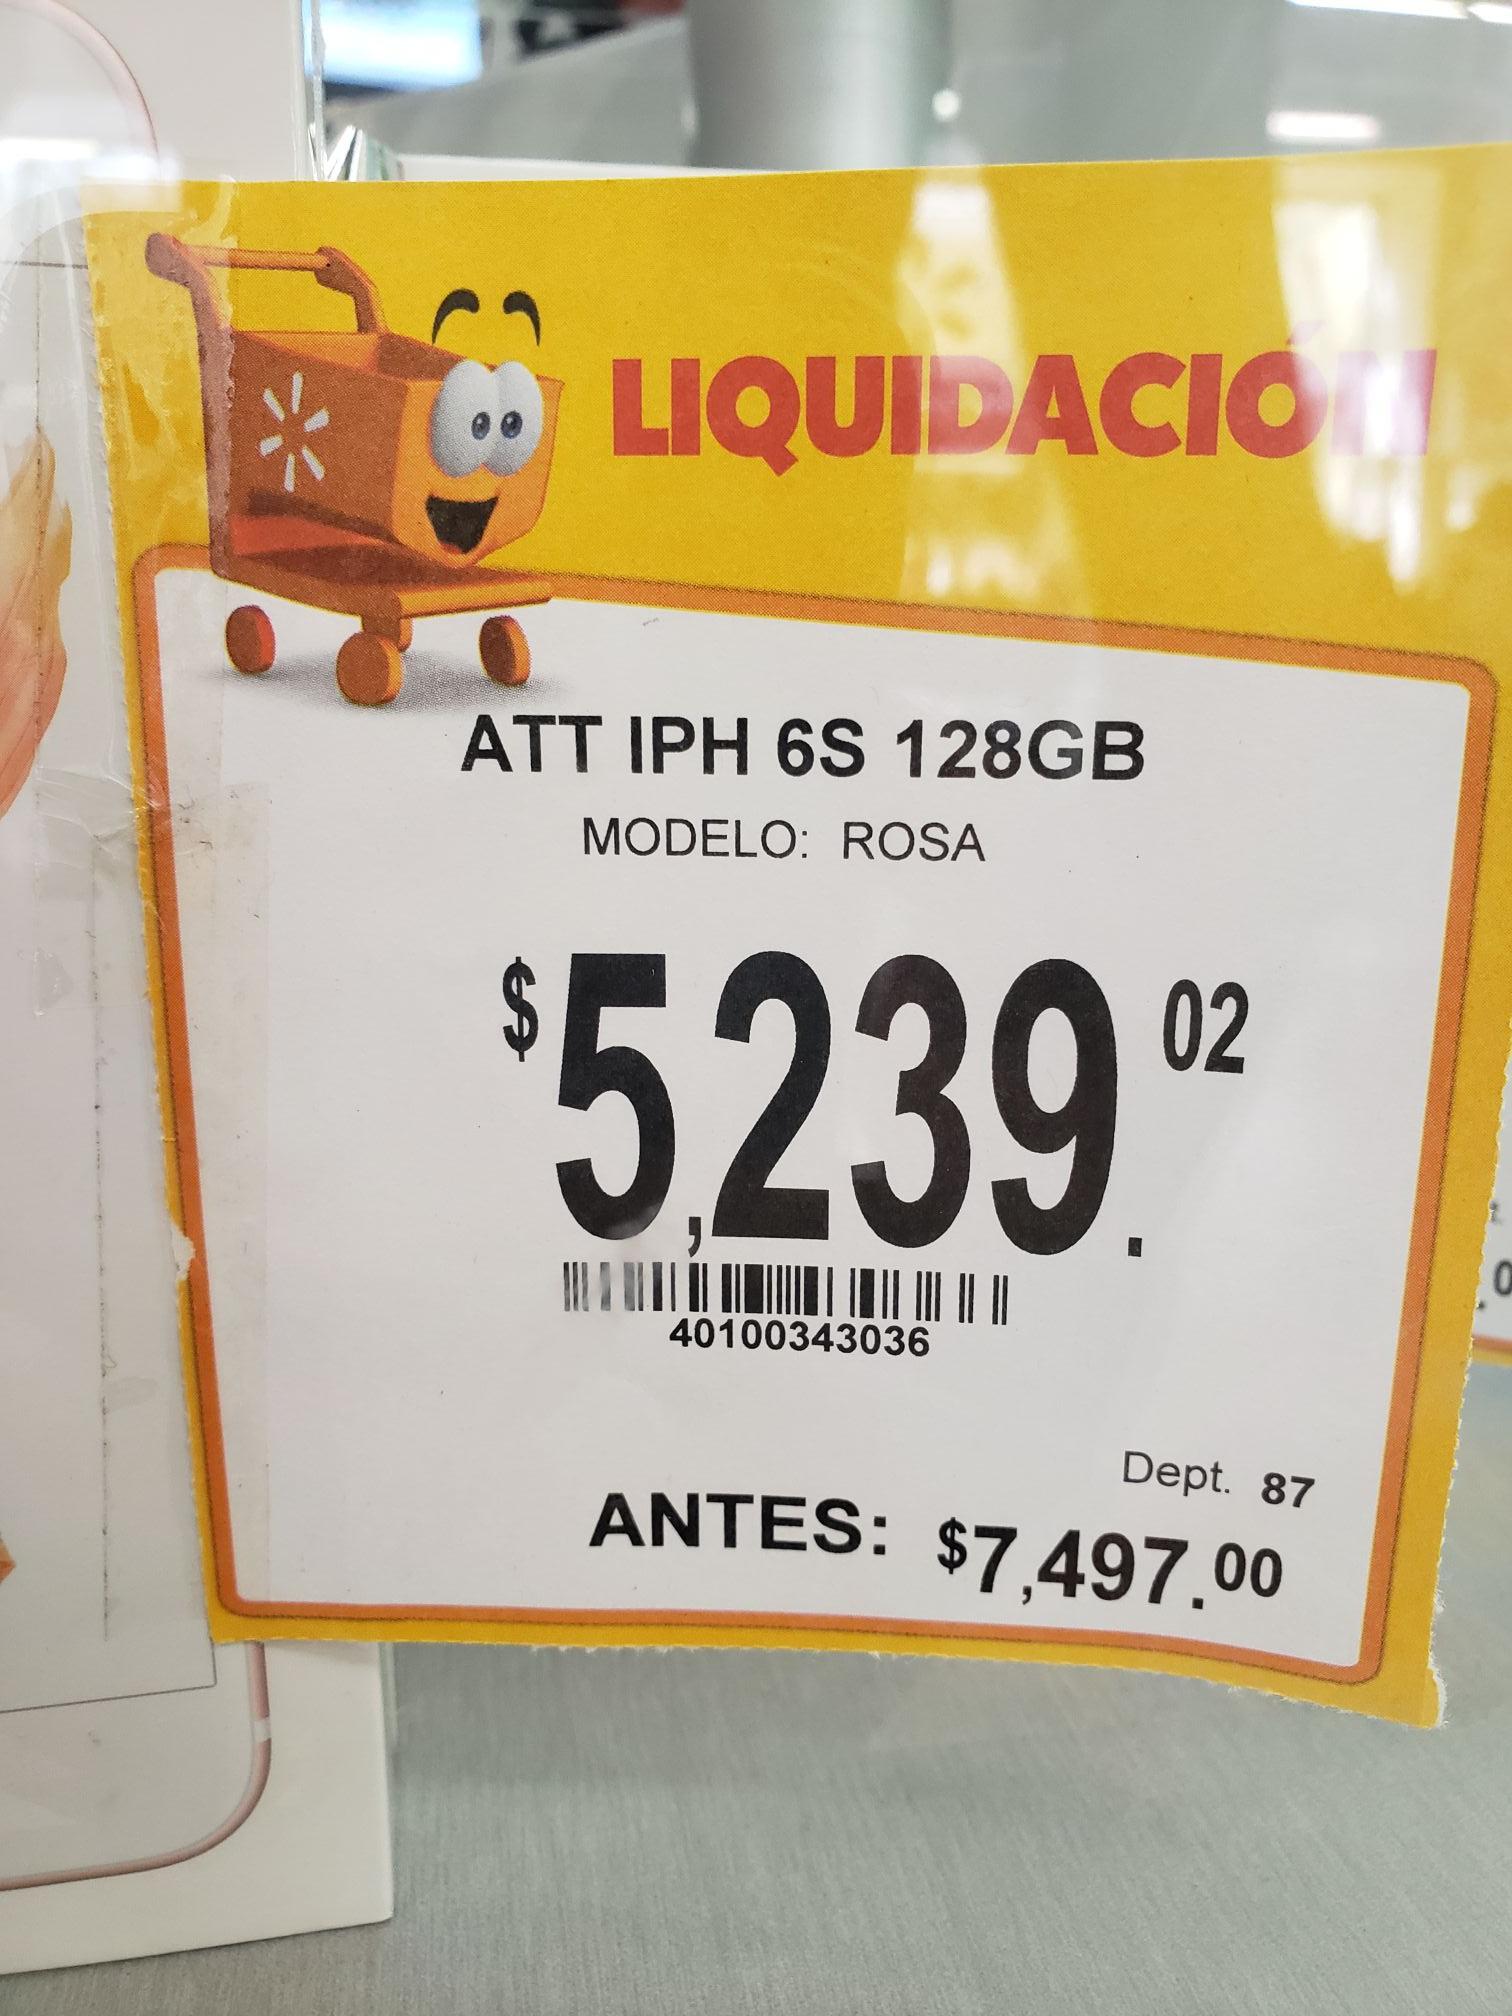 Walmart Patio Santa Fe: Iphone 6s 128 GB Att.